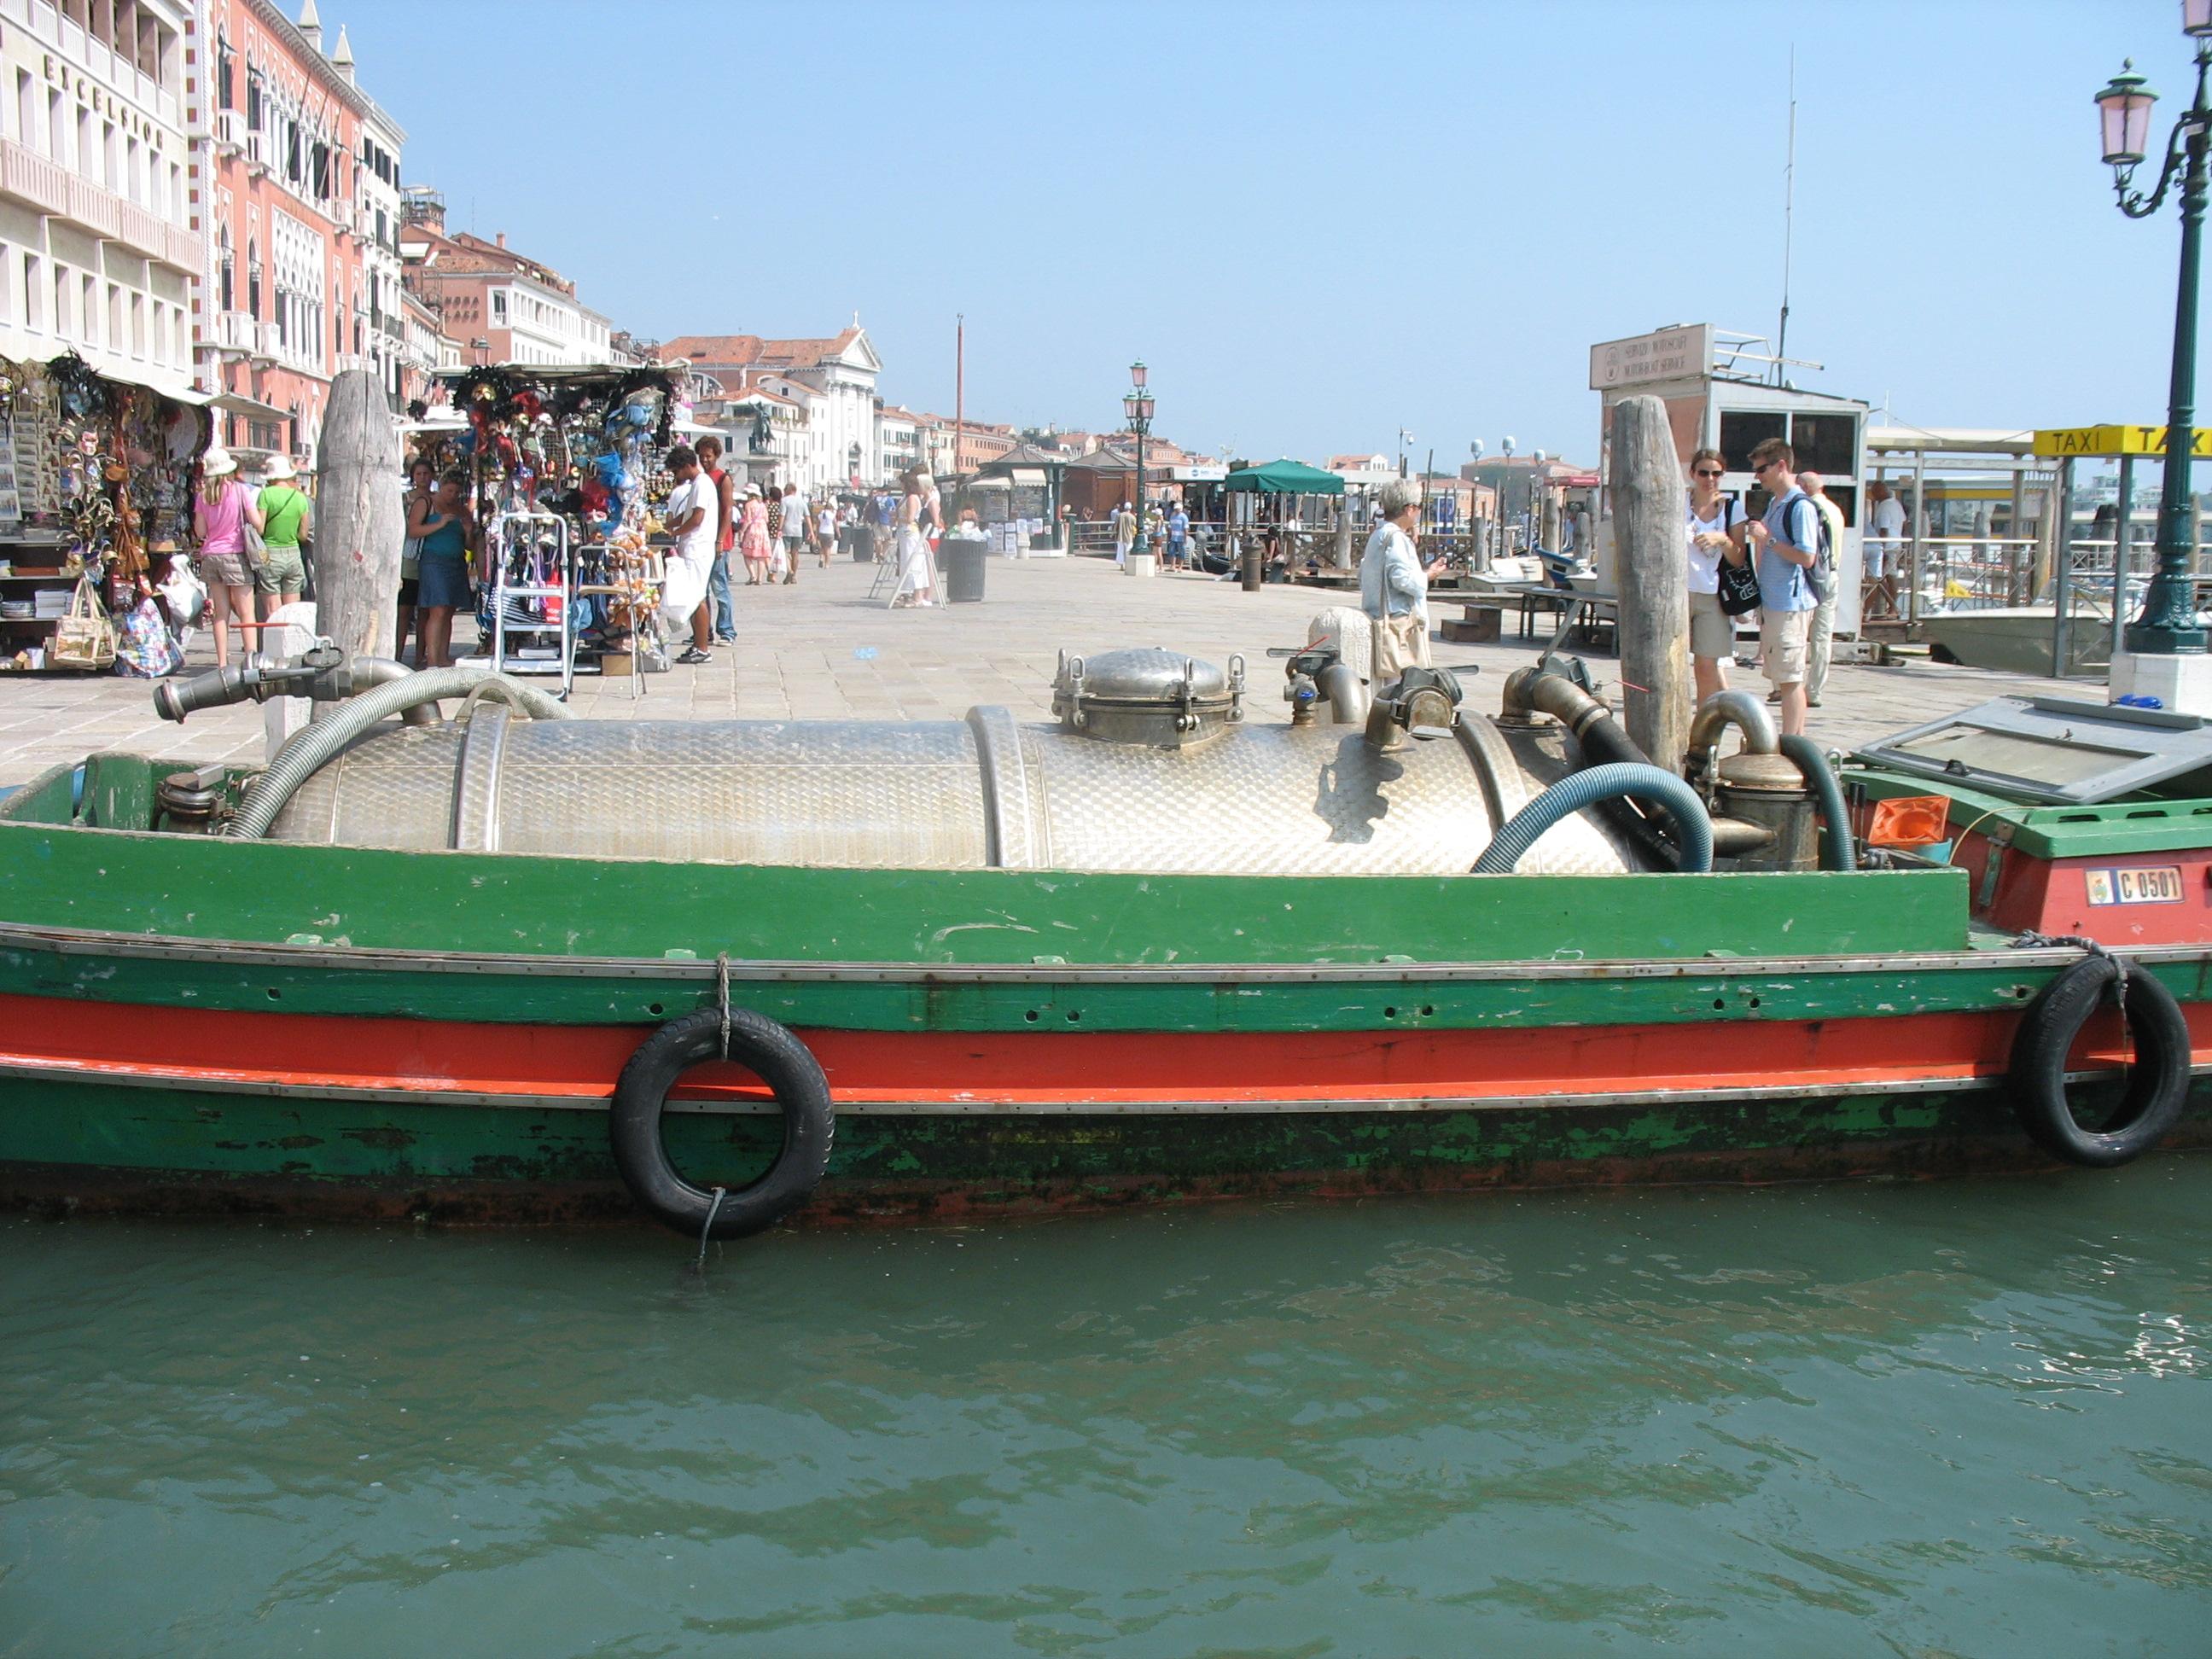 St Marco drain boat